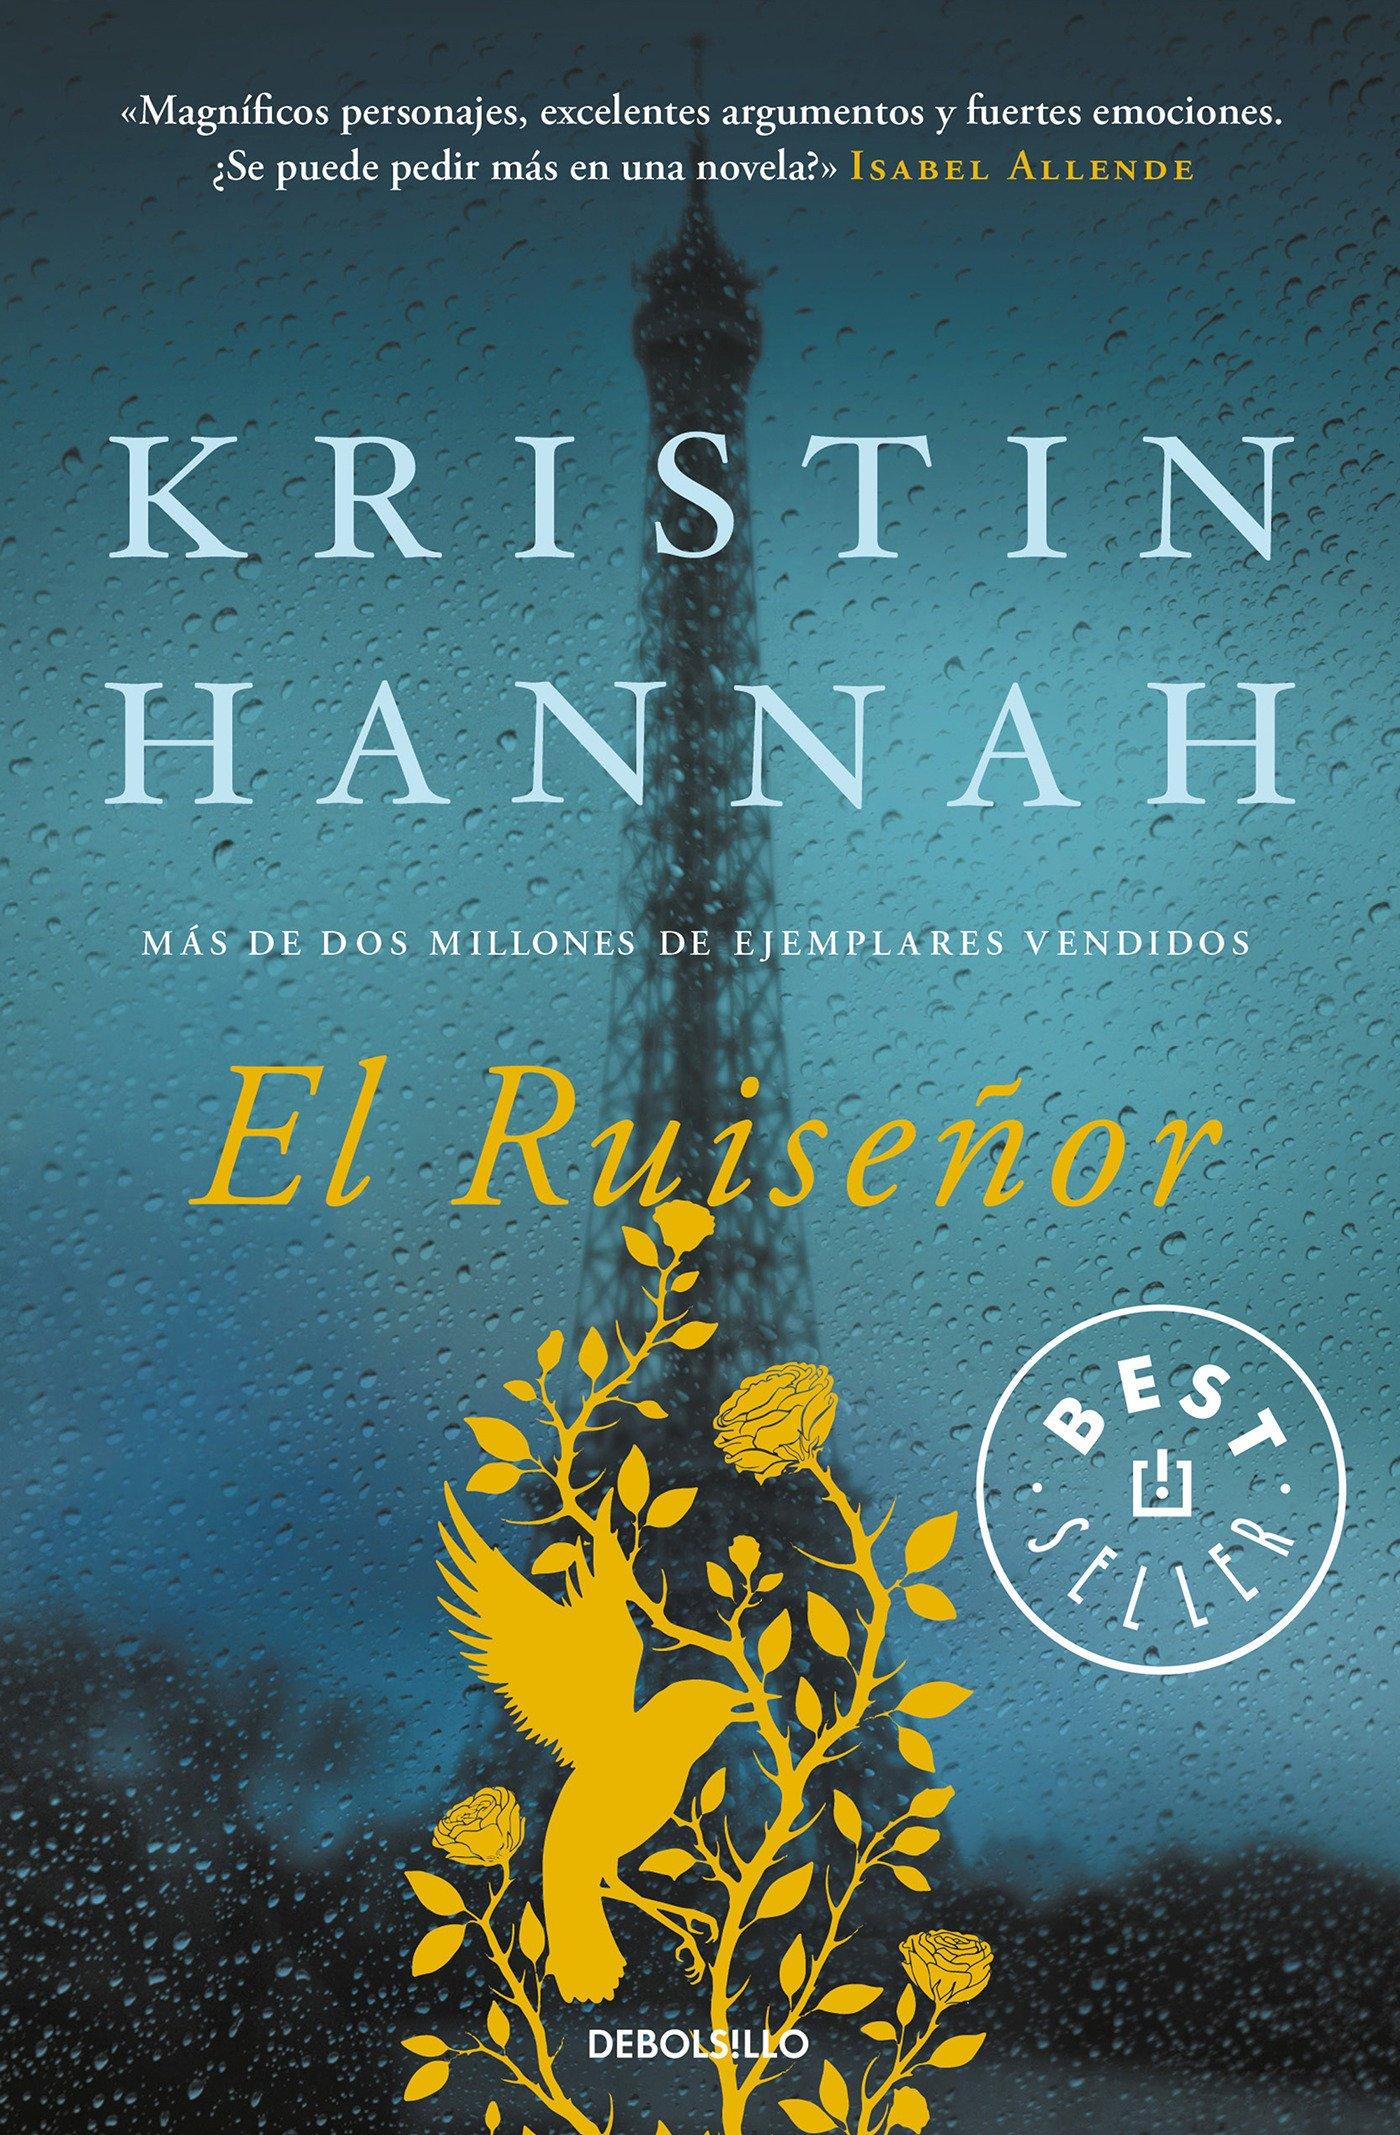 El Ruiseñor (BEST SELLER) Tapa blanda – 2 feb 2017 Kristin Hannah DEBOLSILLO 8466338403 Civilians in war